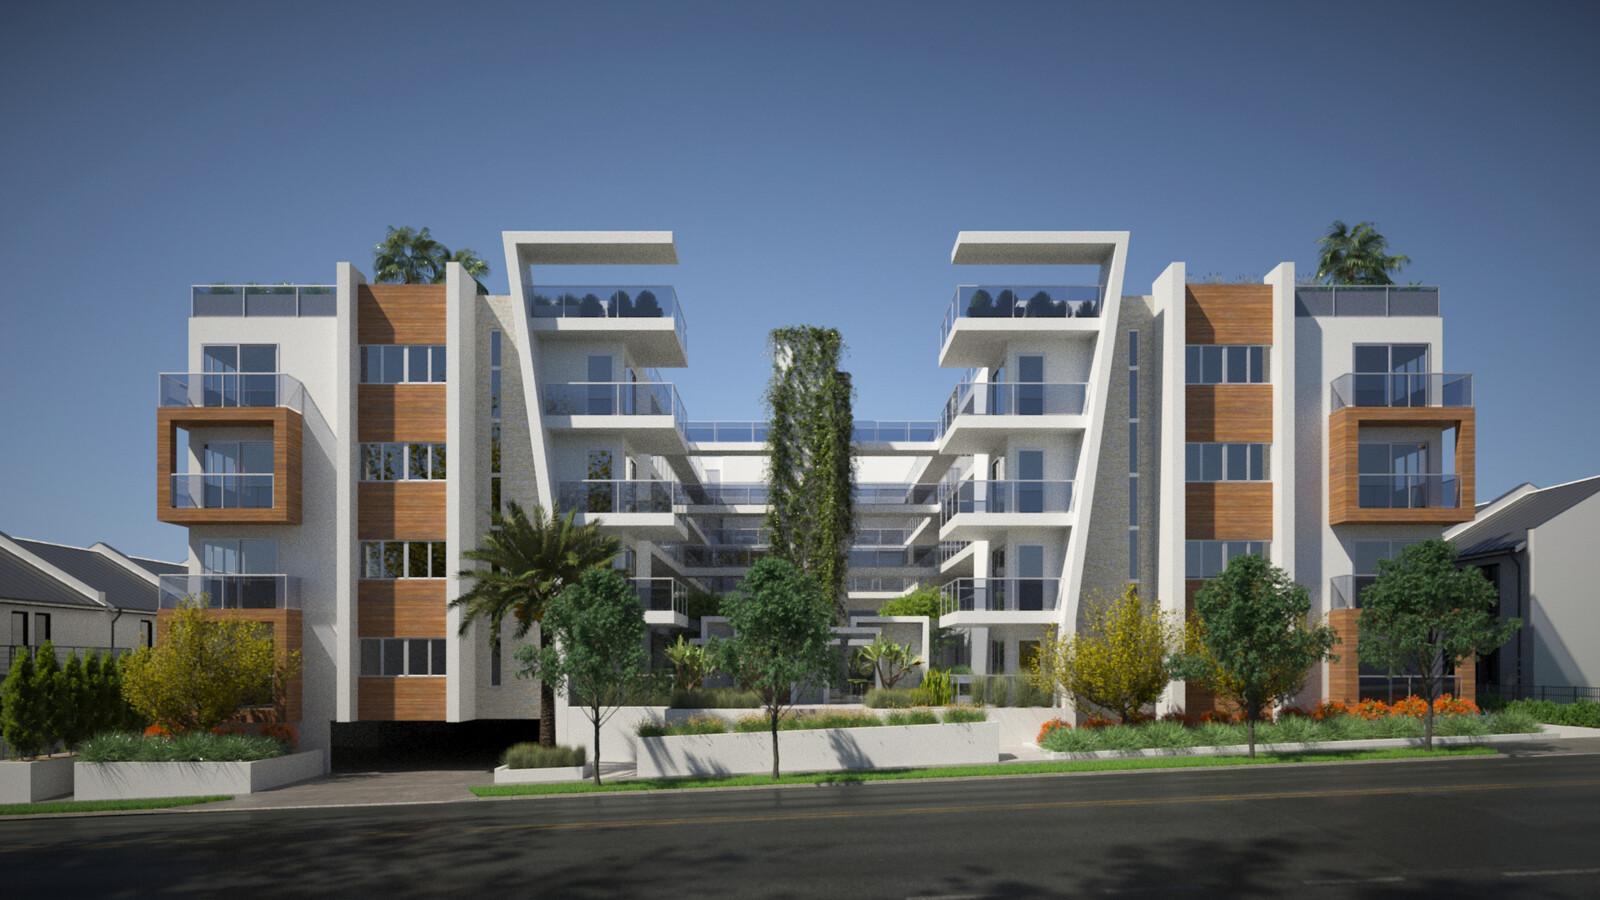 4065 Oakwood Ave, Los Angeles, CA 90004 – 68 Unit Shovel Ready Development Site